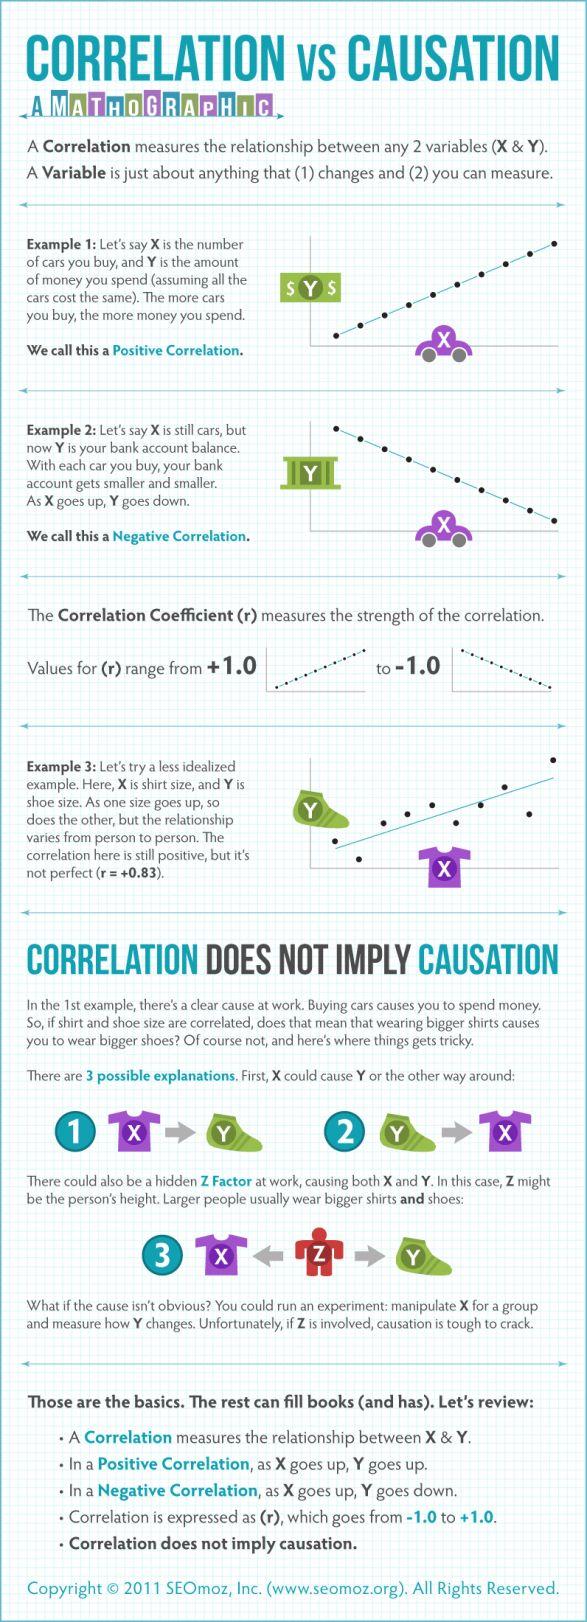 Correlation vs. Causation